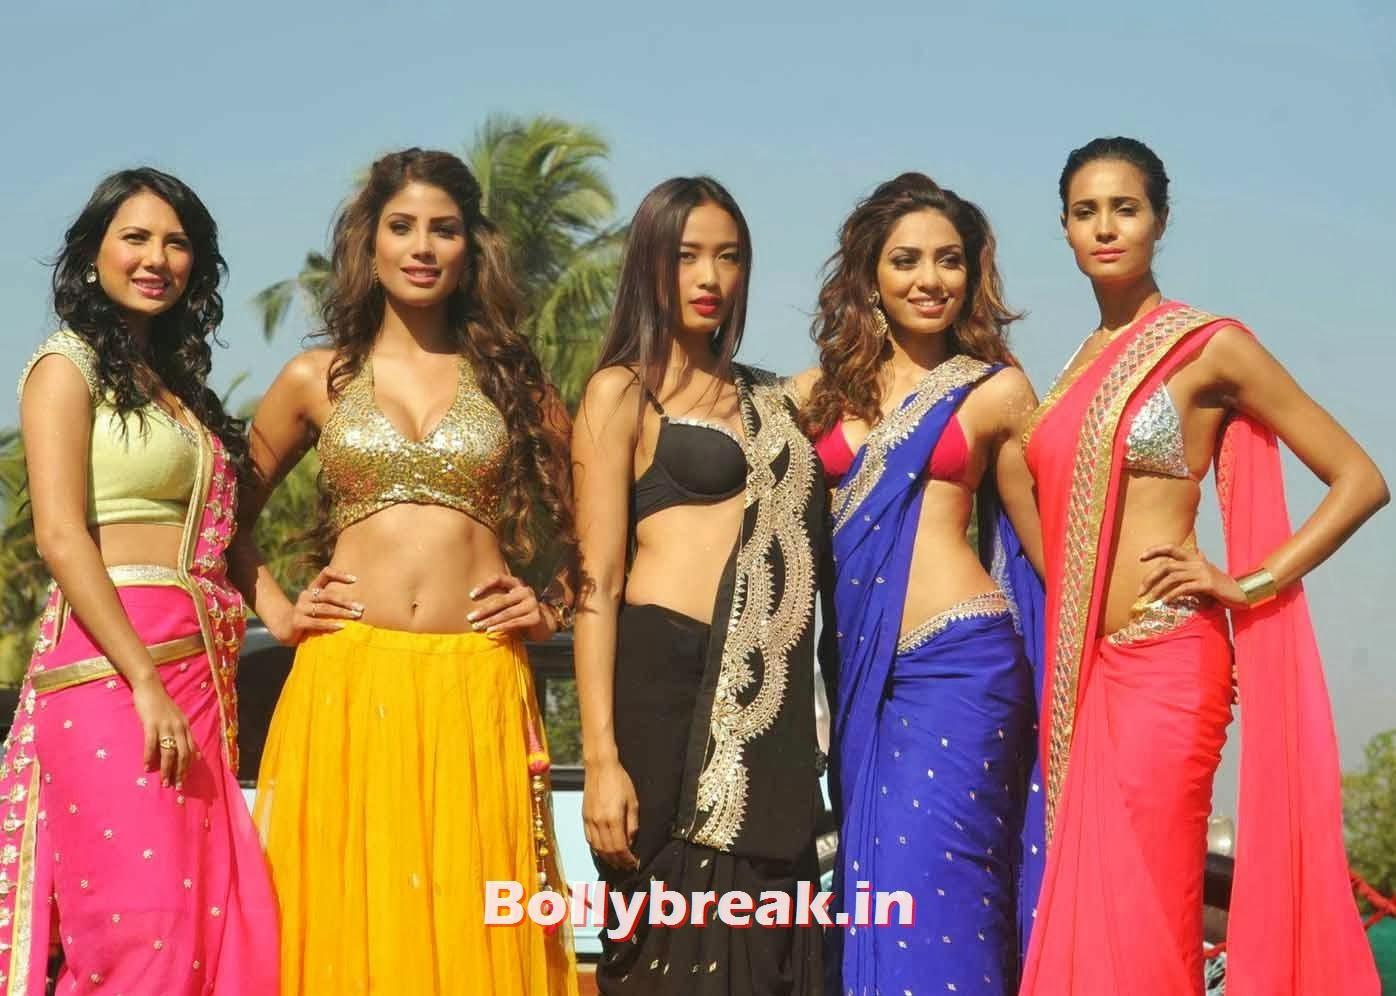 Nicole Faria, Full Set : Super Hot Models at Kingfisher Calendar Launch In Alibaug Mumbai